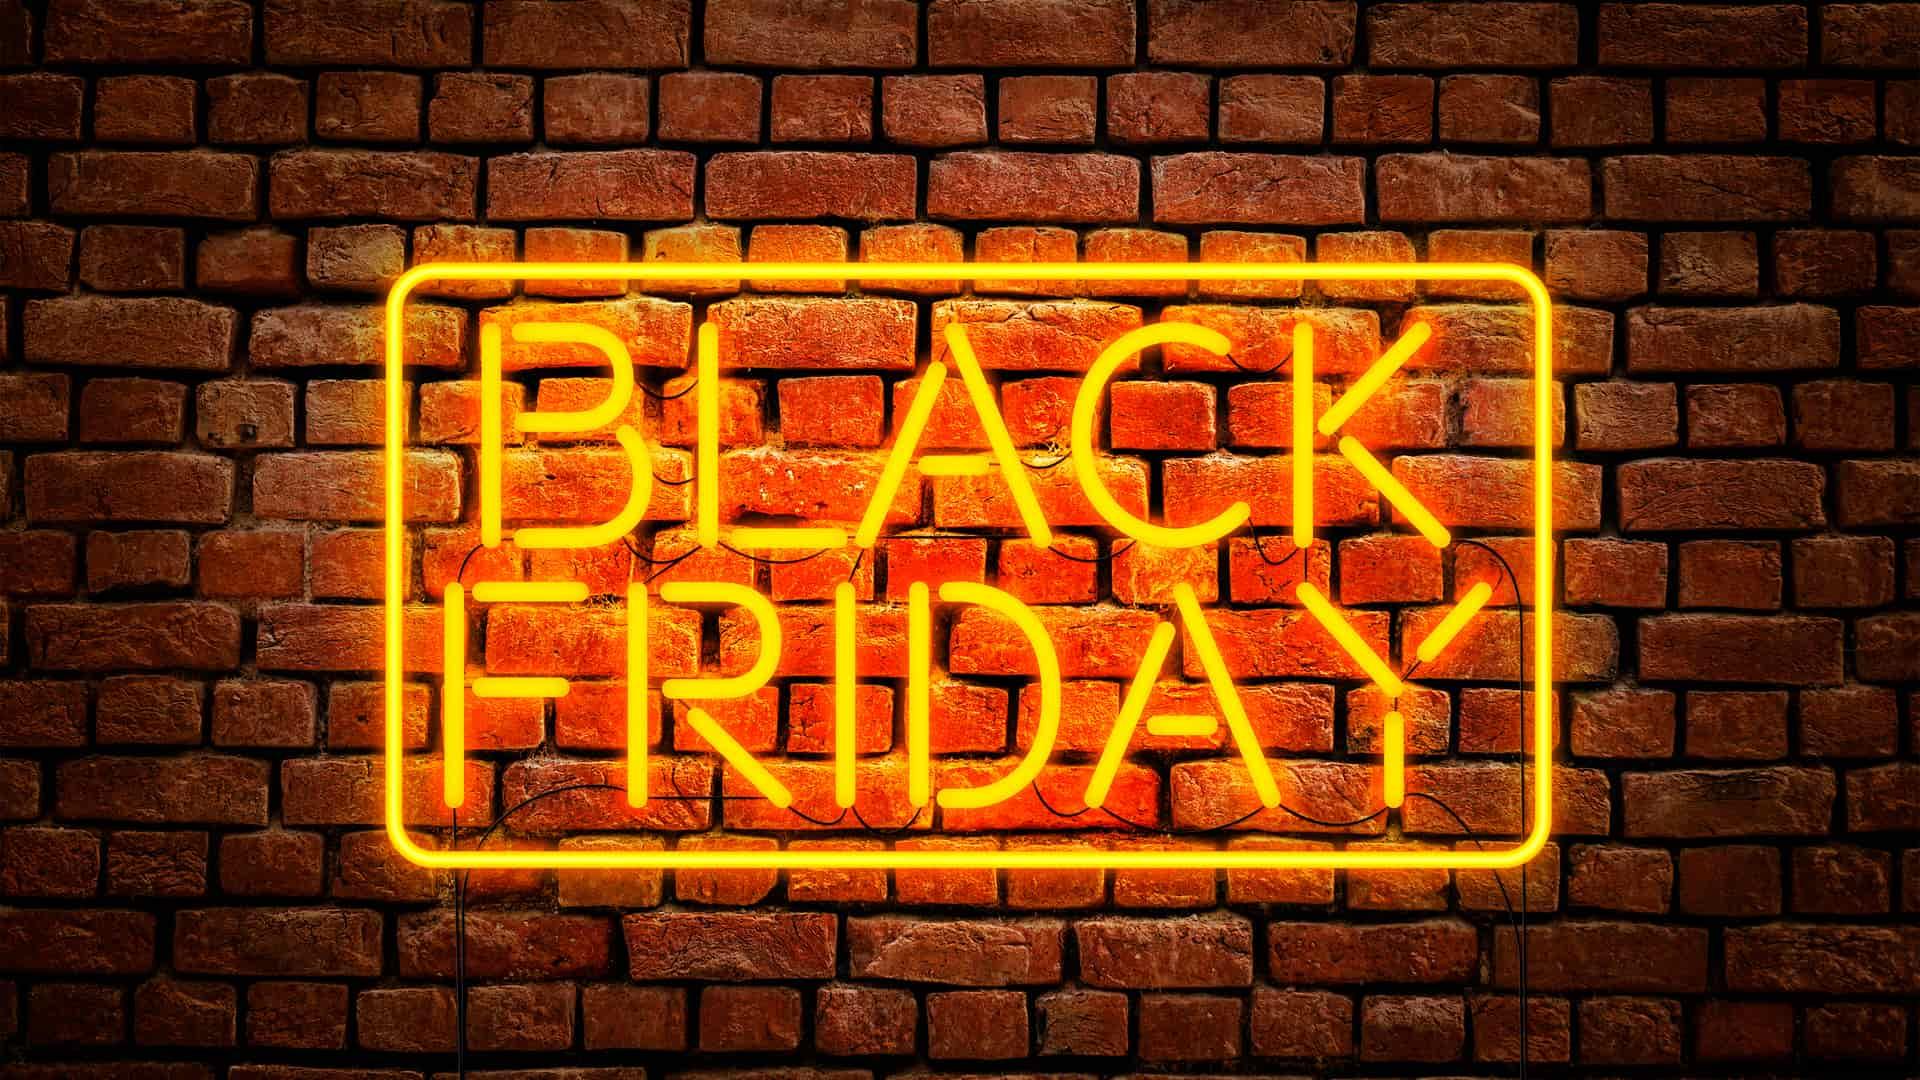 Euskaltel Black Friday 2021: fechas y ofertas